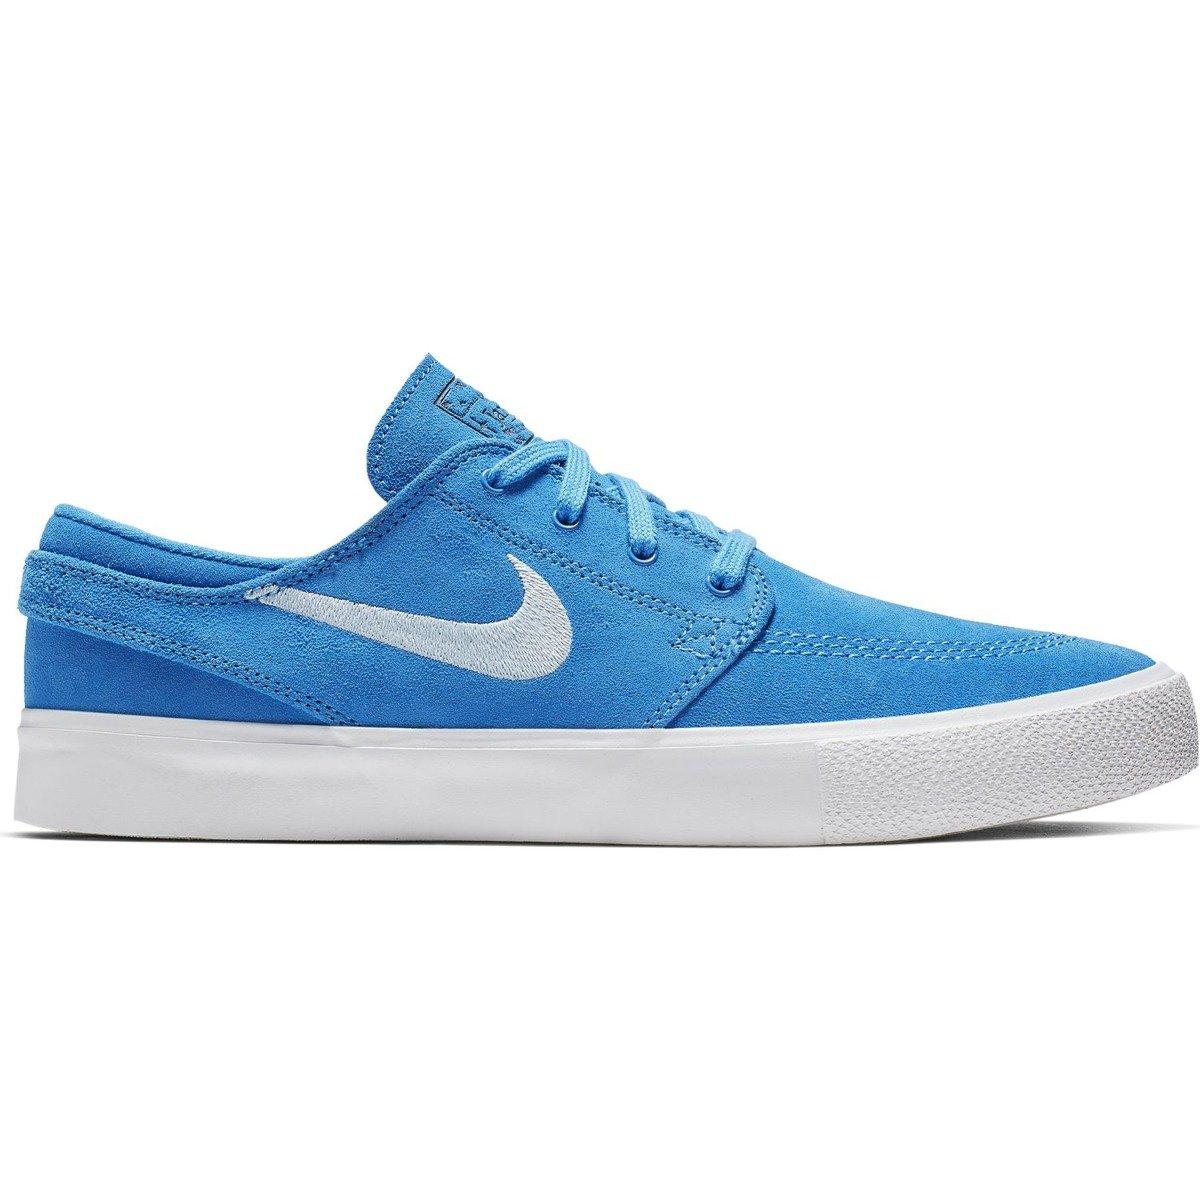 diseño innovador Amazonas mejor lugar Nike Sb Zoom Stefan Janoski RM Lt Photo Blue/lt Armory Blue-black-black